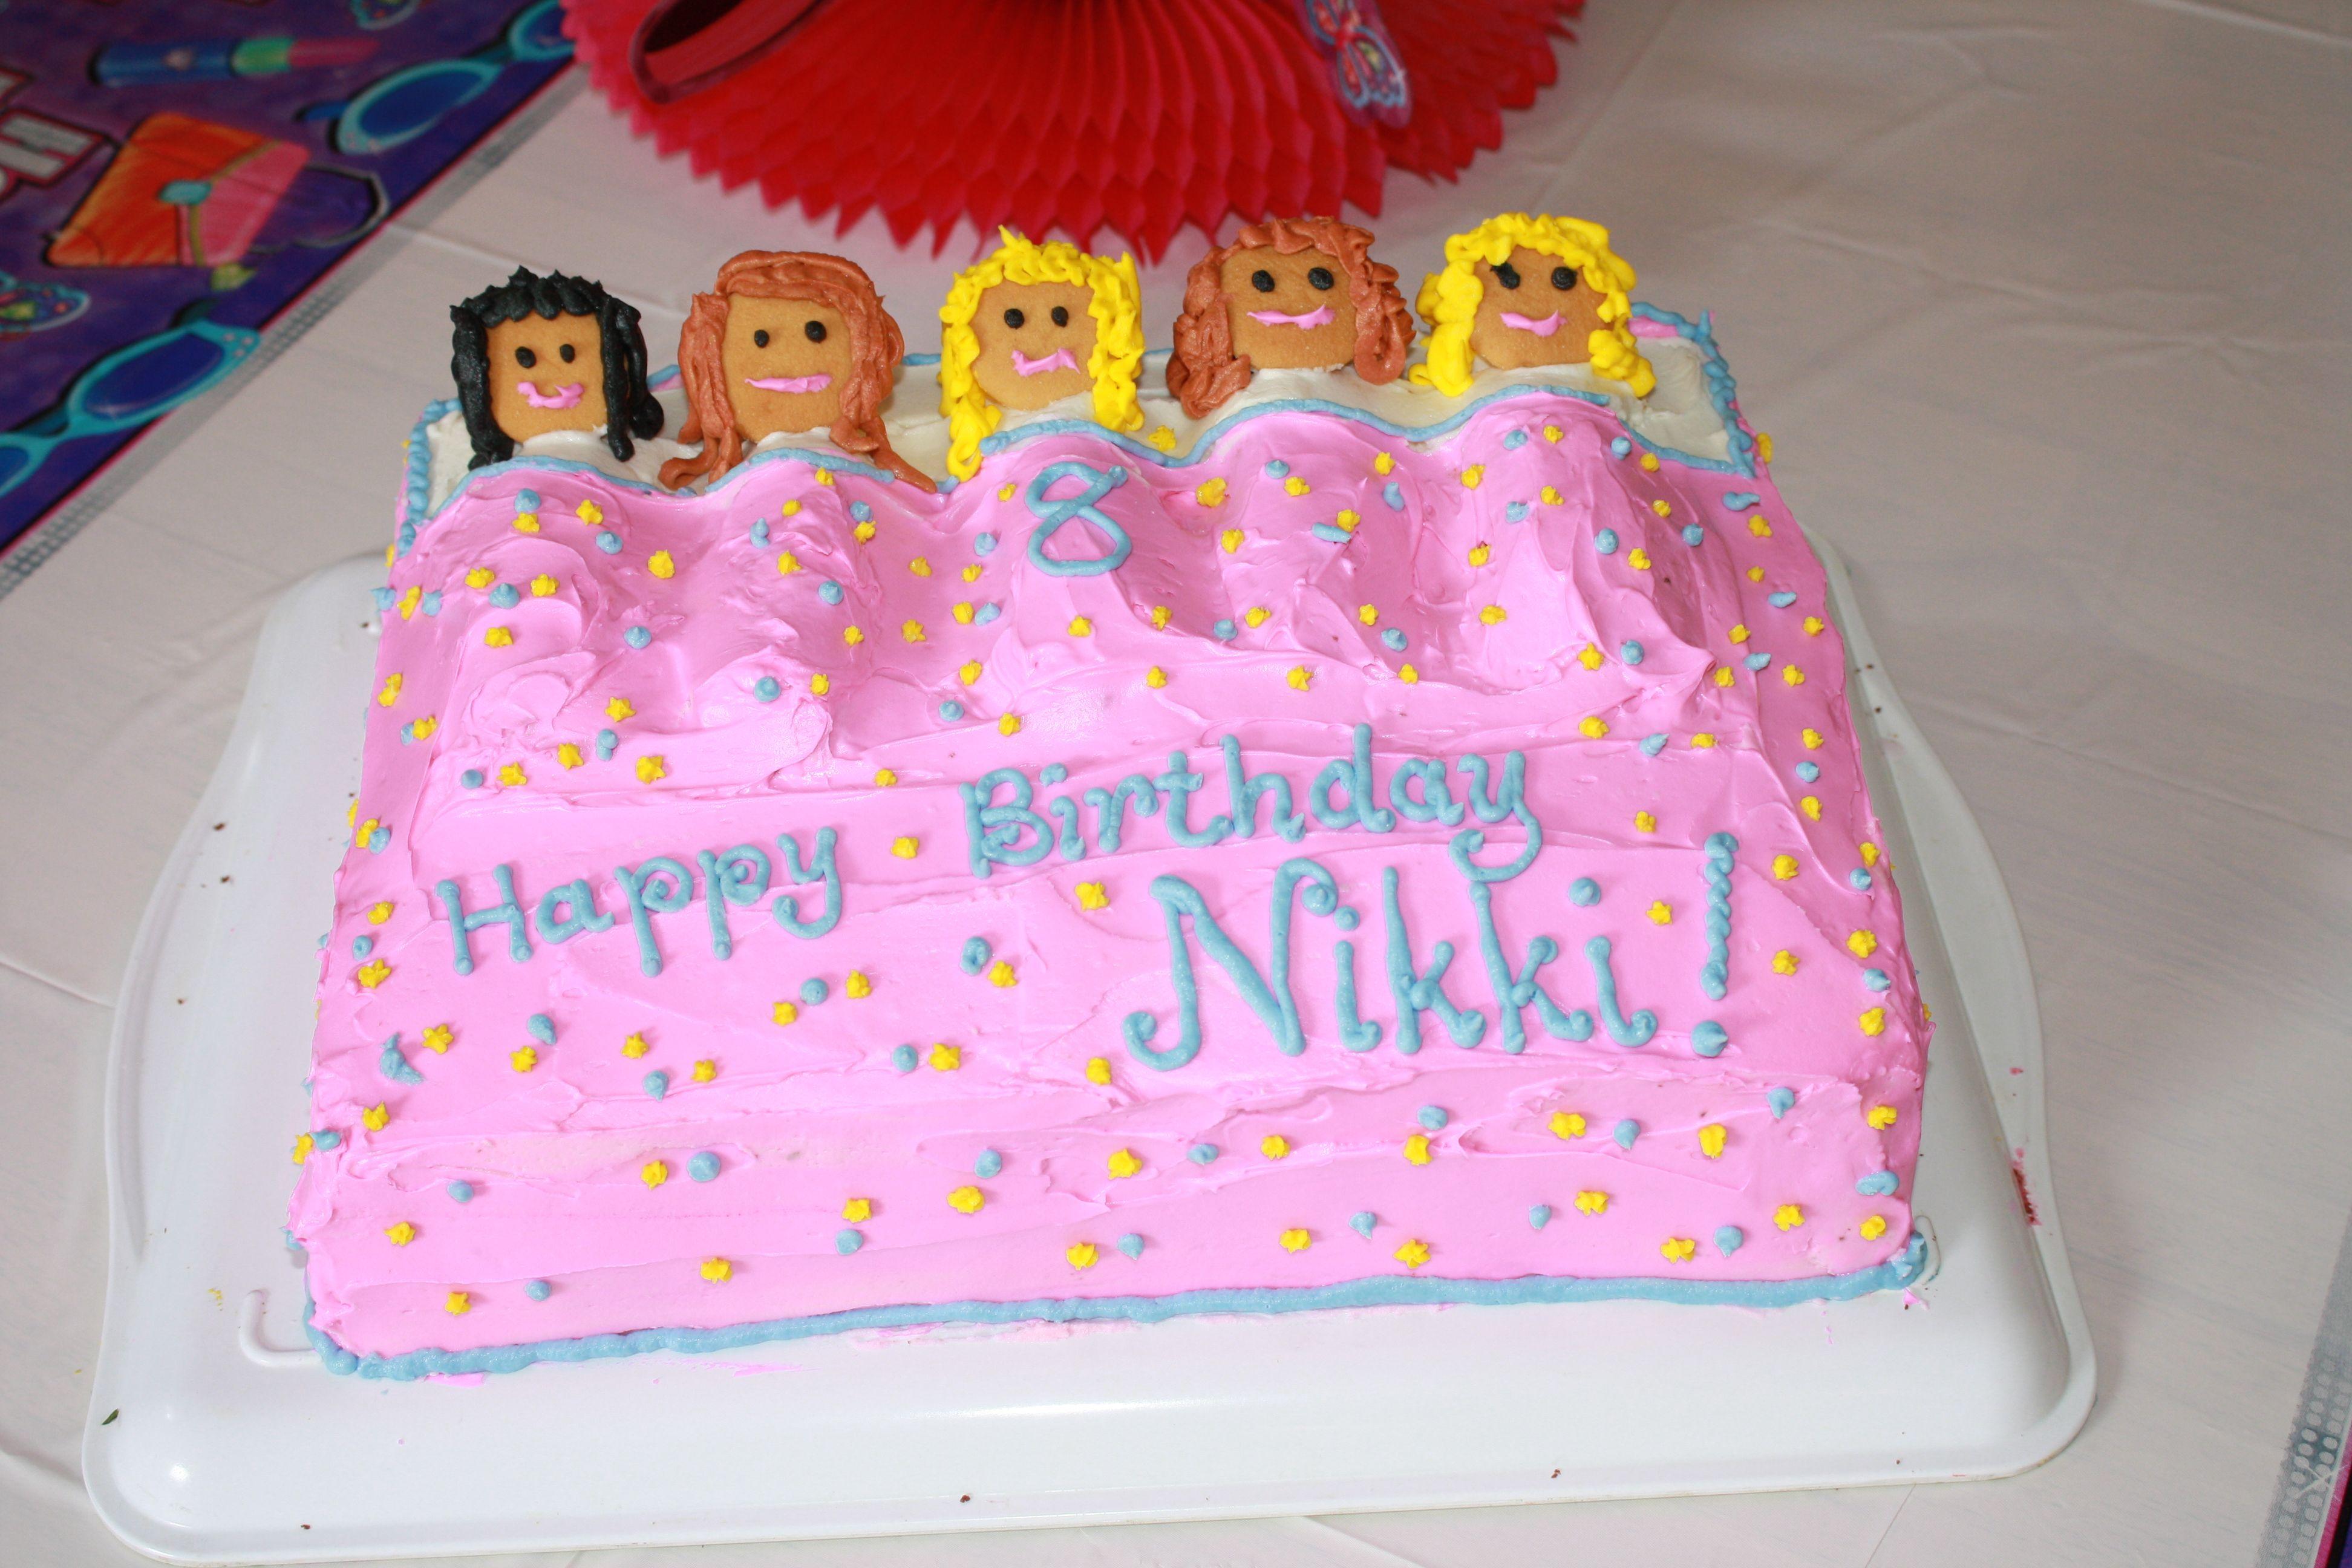 Slumber Party Cake Images : Slumber party birthday cake! Just Desserts! Pinterest